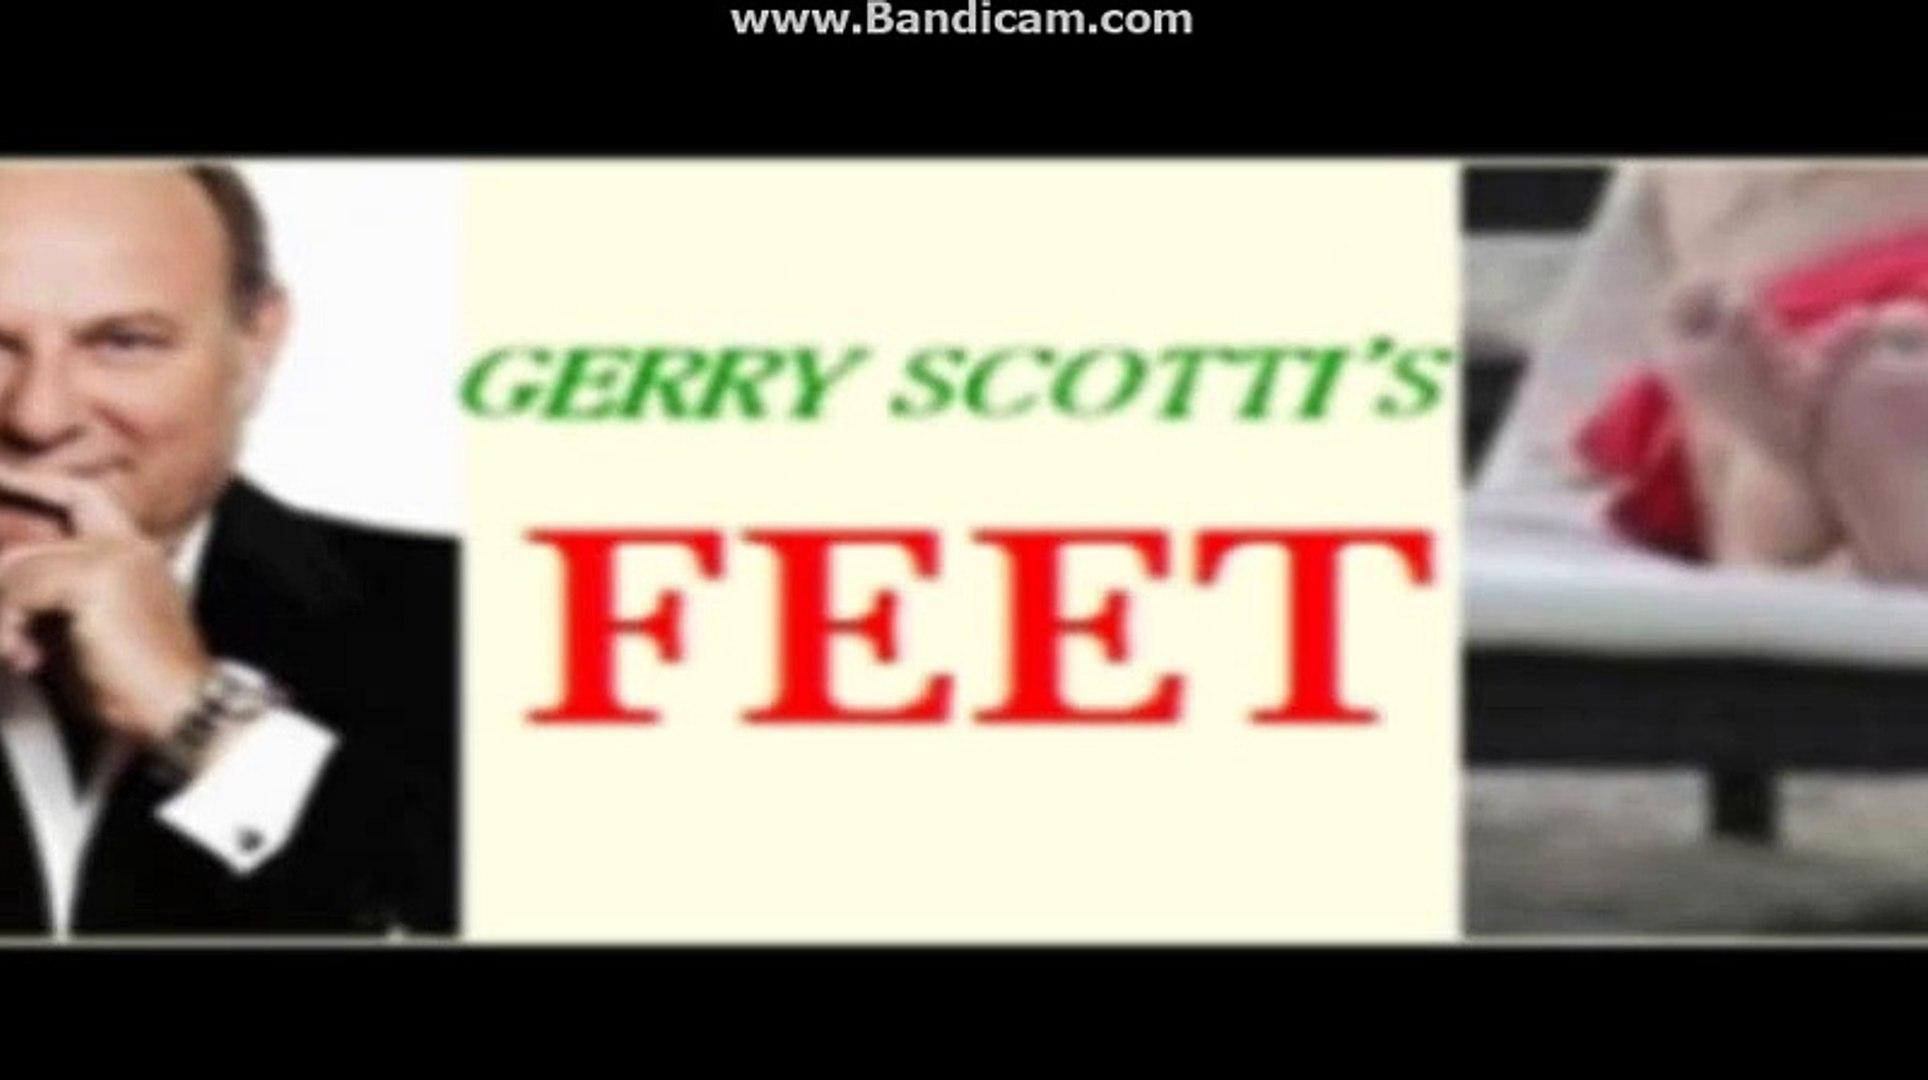 Gerry Scotti's Feet 1000 followers!